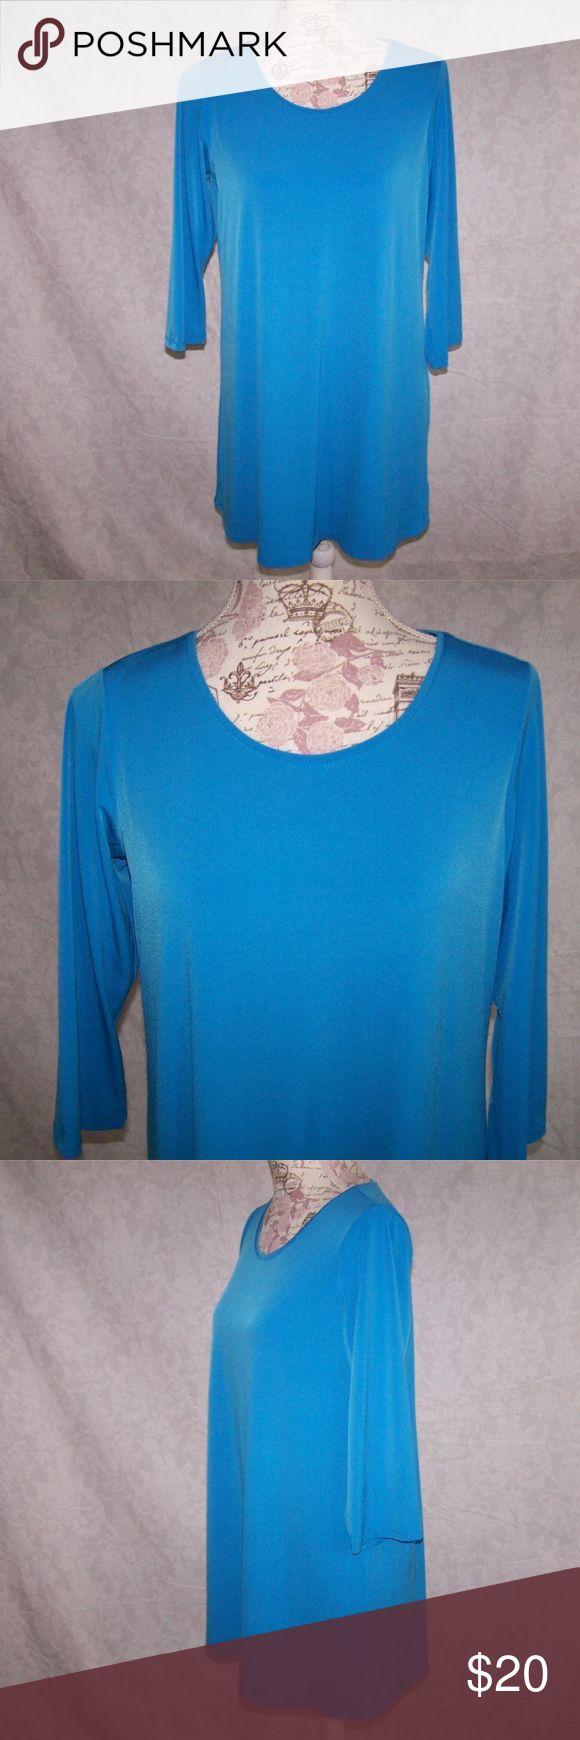 "SUSAN GRAVER Tunic Top S Liquid Knit Stretch Susan Graver size small tunic top 3/4 sleeves stretchy blue  95%  polyester  5%  spandex machine wash  bust  38"" length  30"" sleeve length 17""  very nice Susan Graver Tops Tunics"